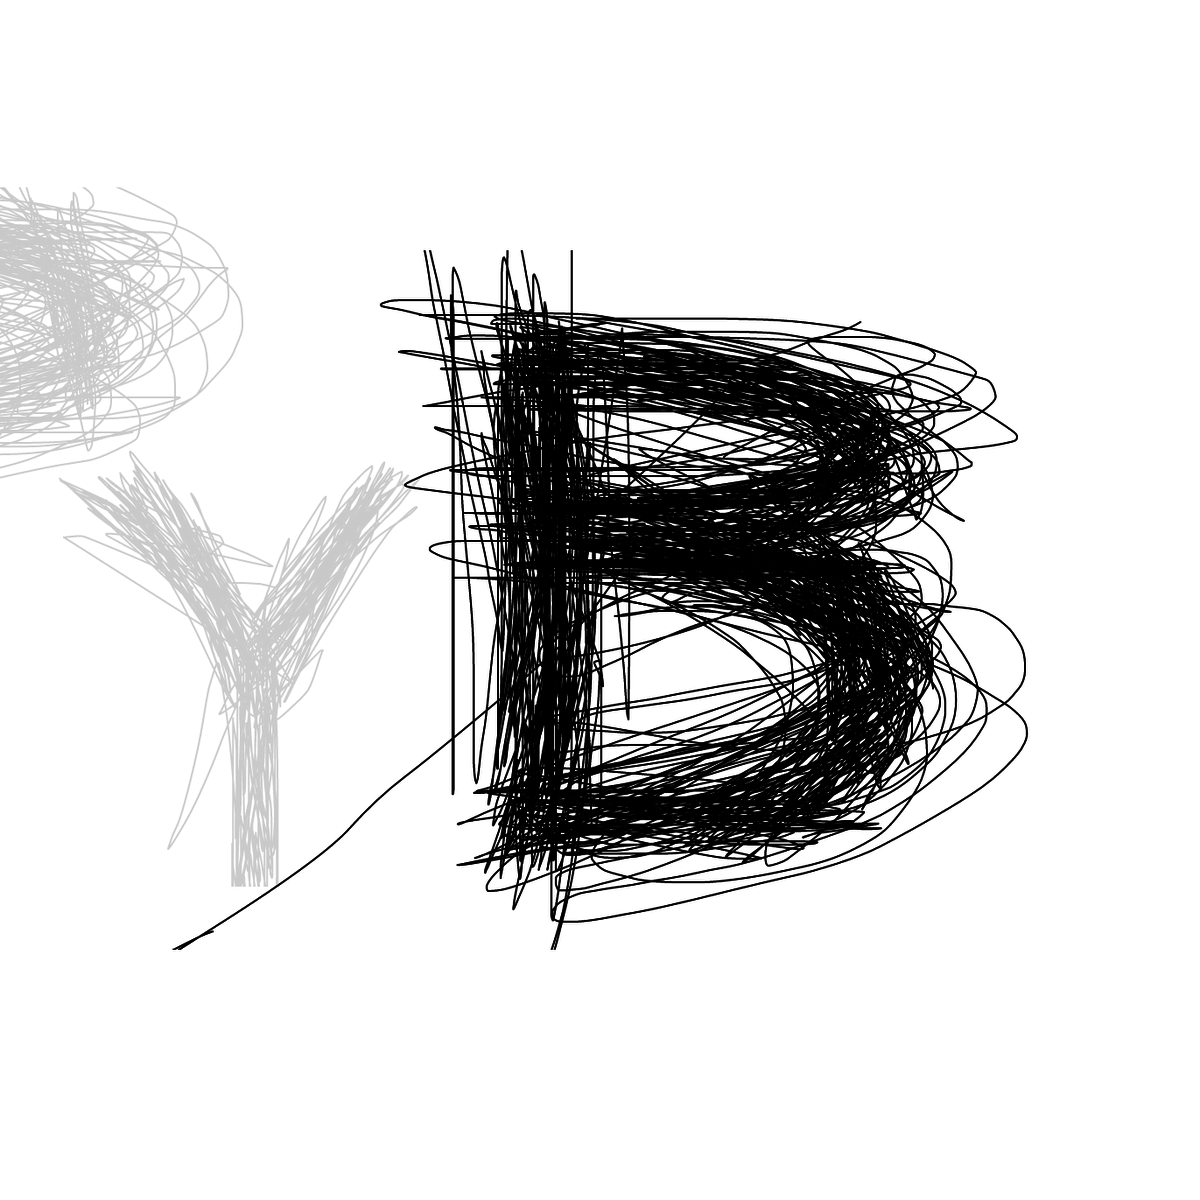 BAAAM drawing#13472 lat:59.2589149475097660lng: 10.4665212631225590